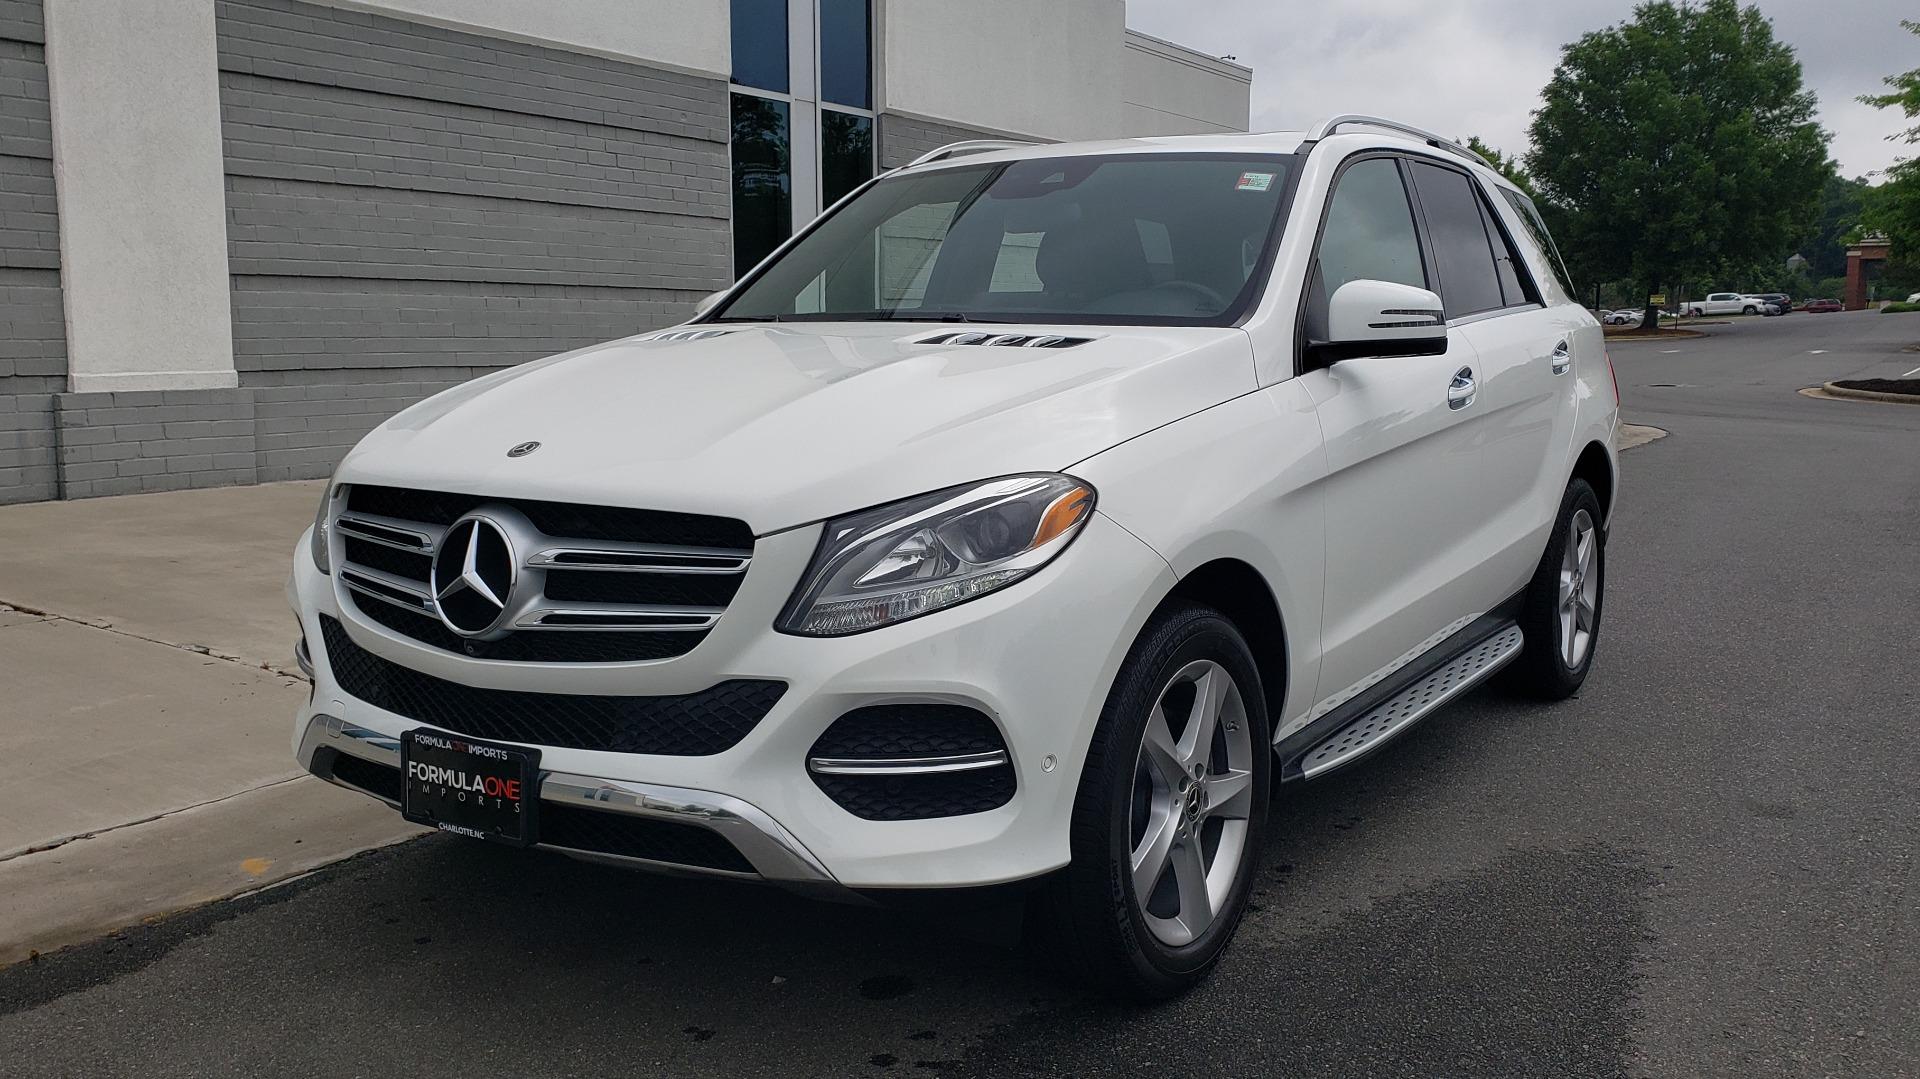 Used 2018 Mercedes-Benz GLE 350 4MATIC / PREM PKG / NAV / PARK ASST / K/H SND / HITCH / REARVIEW for sale $40,801 at Formula Imports in Charlotte NC 28227 3